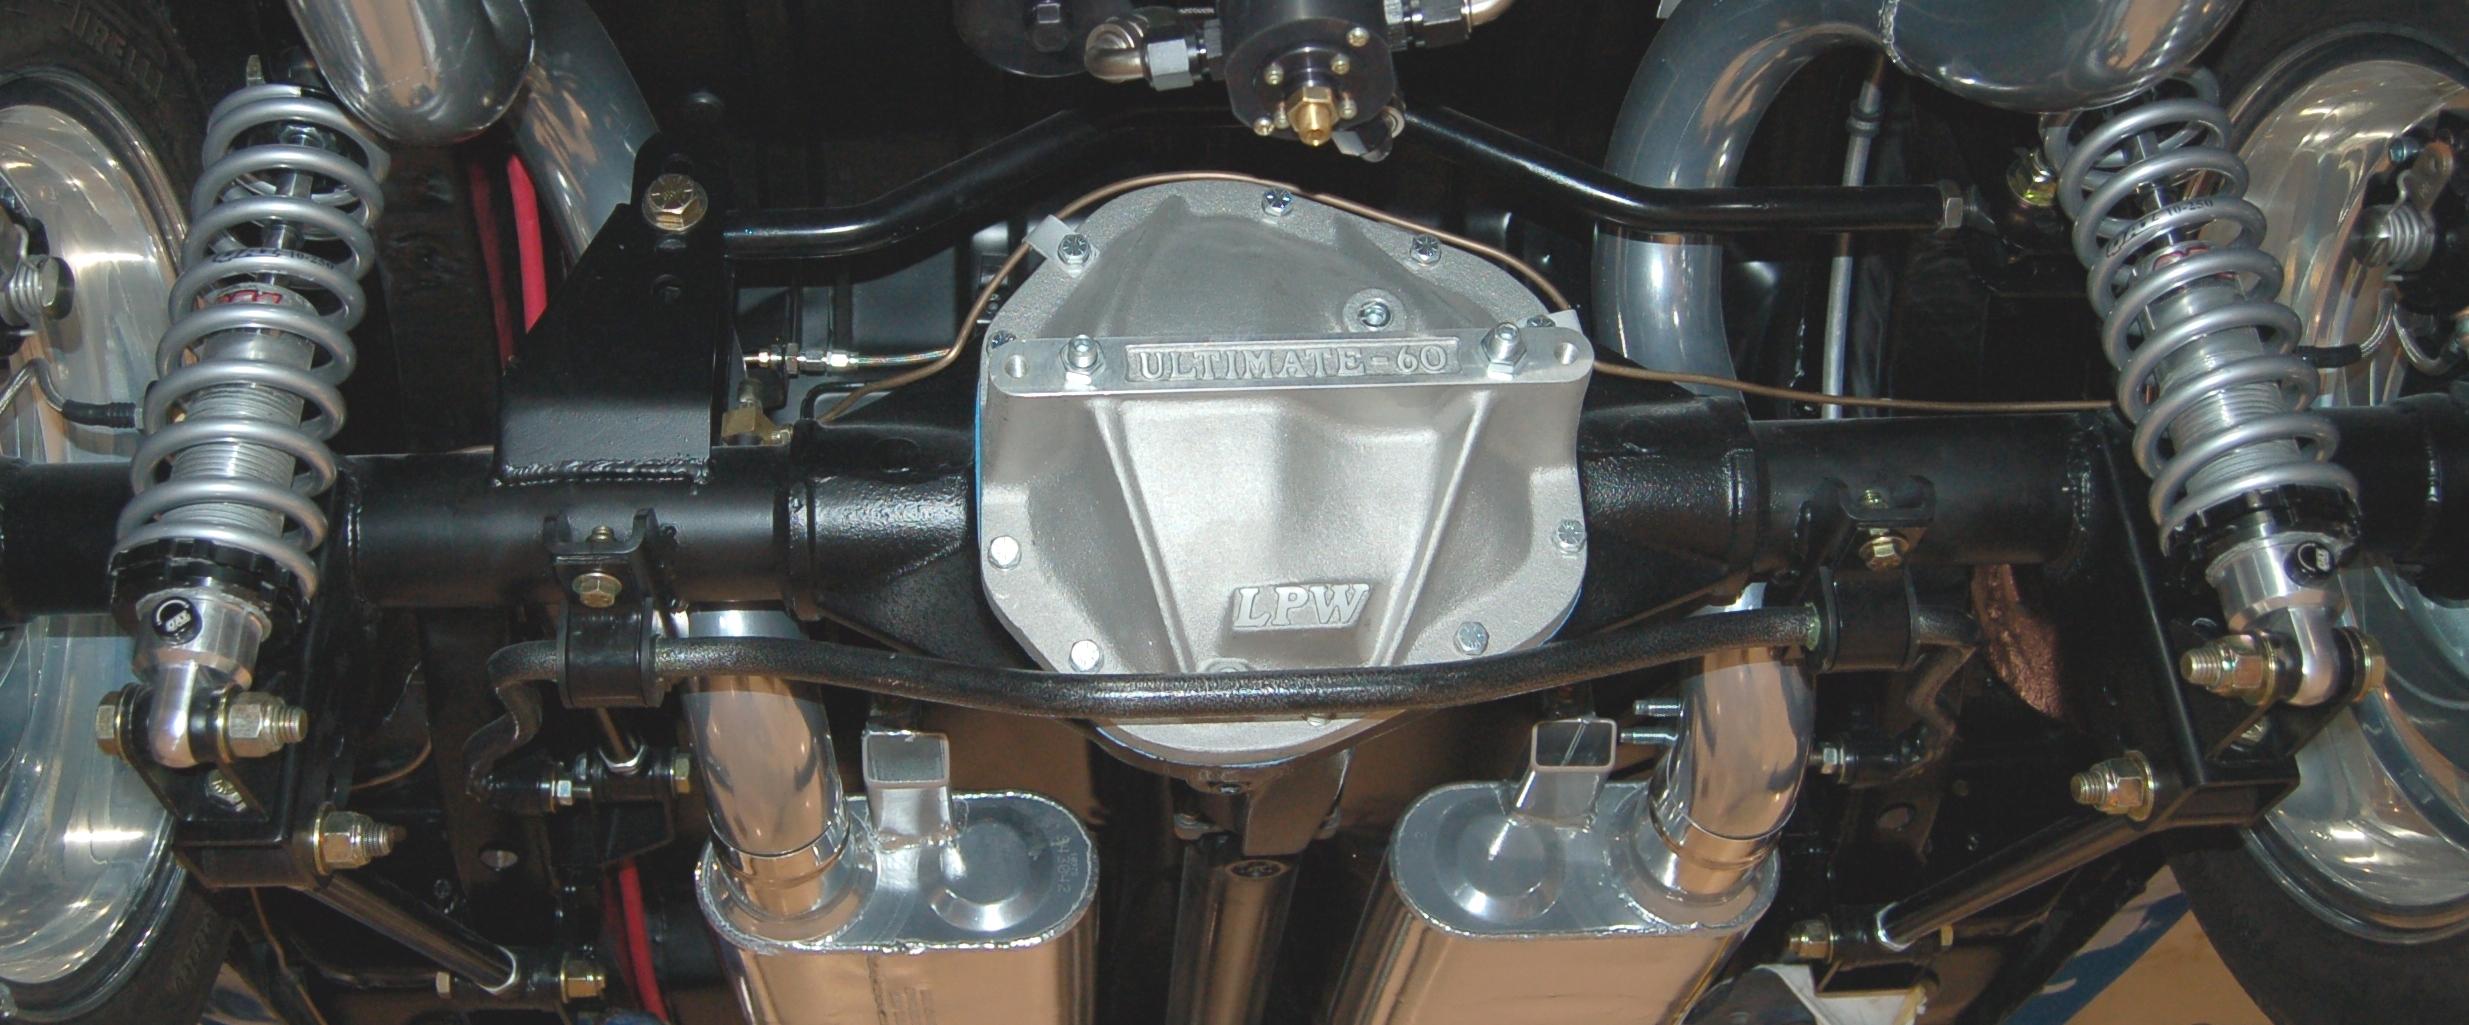 4-Link MOPAR Coil-Over Rear Suspension Systems | Control Freak